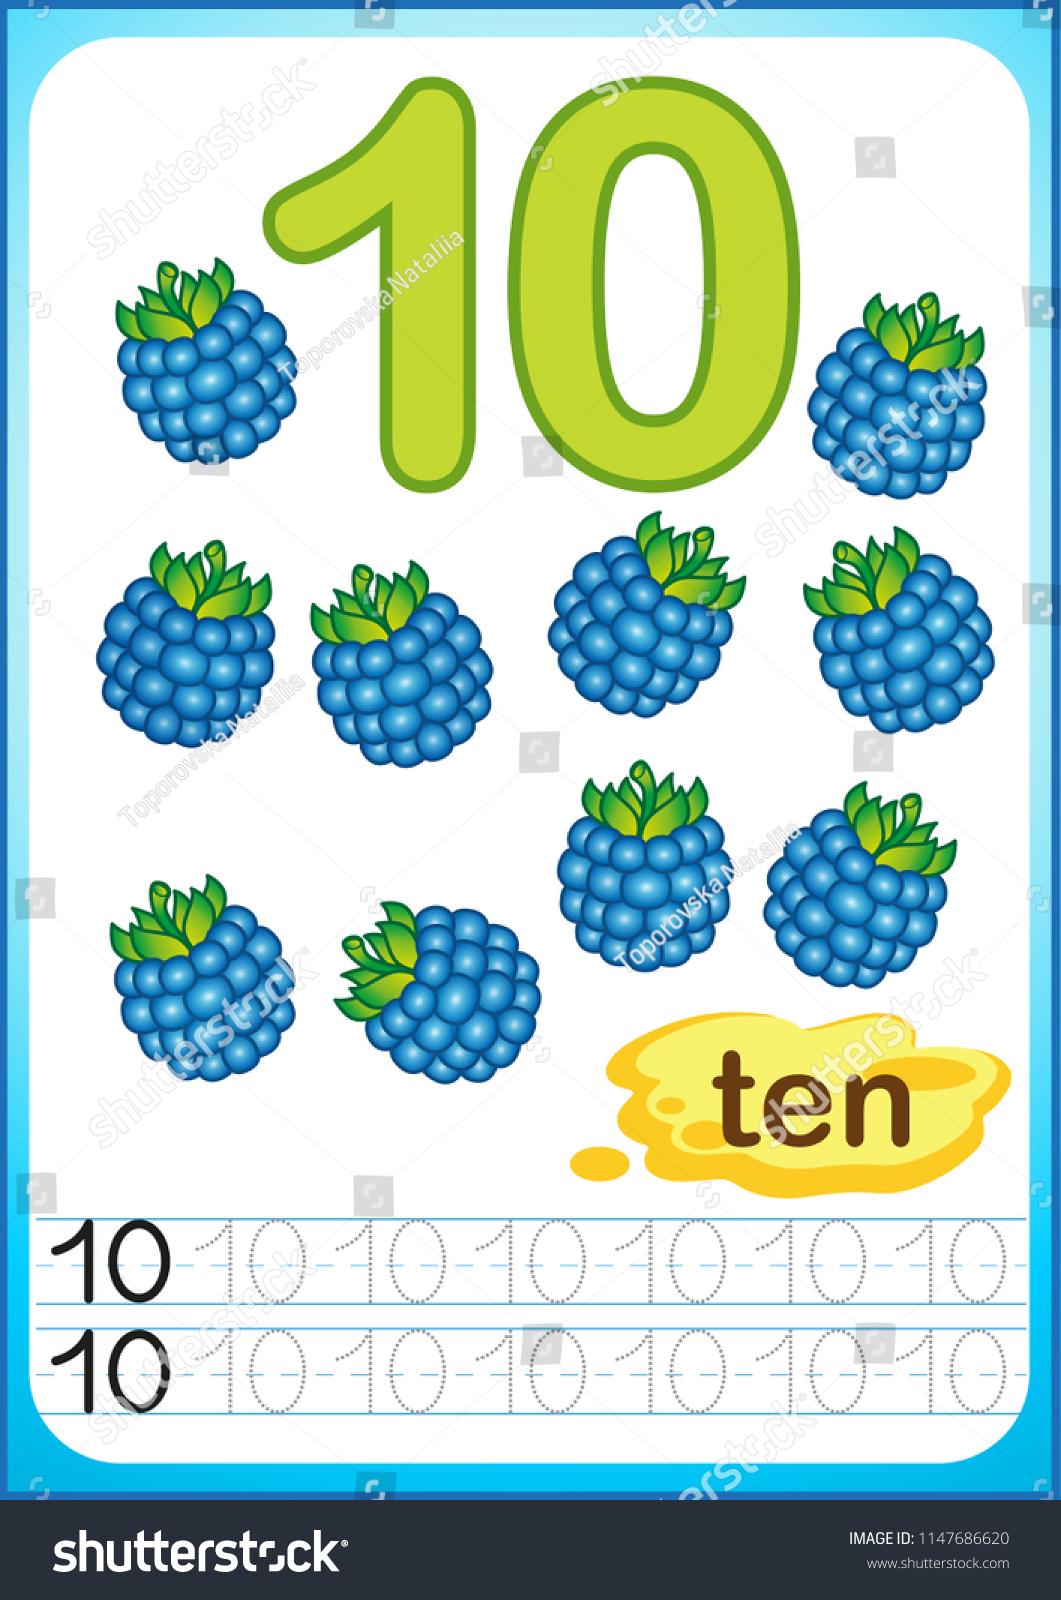 Printable Worksheet Kindergarten Preschool Ripe Berries Stock Vector ...